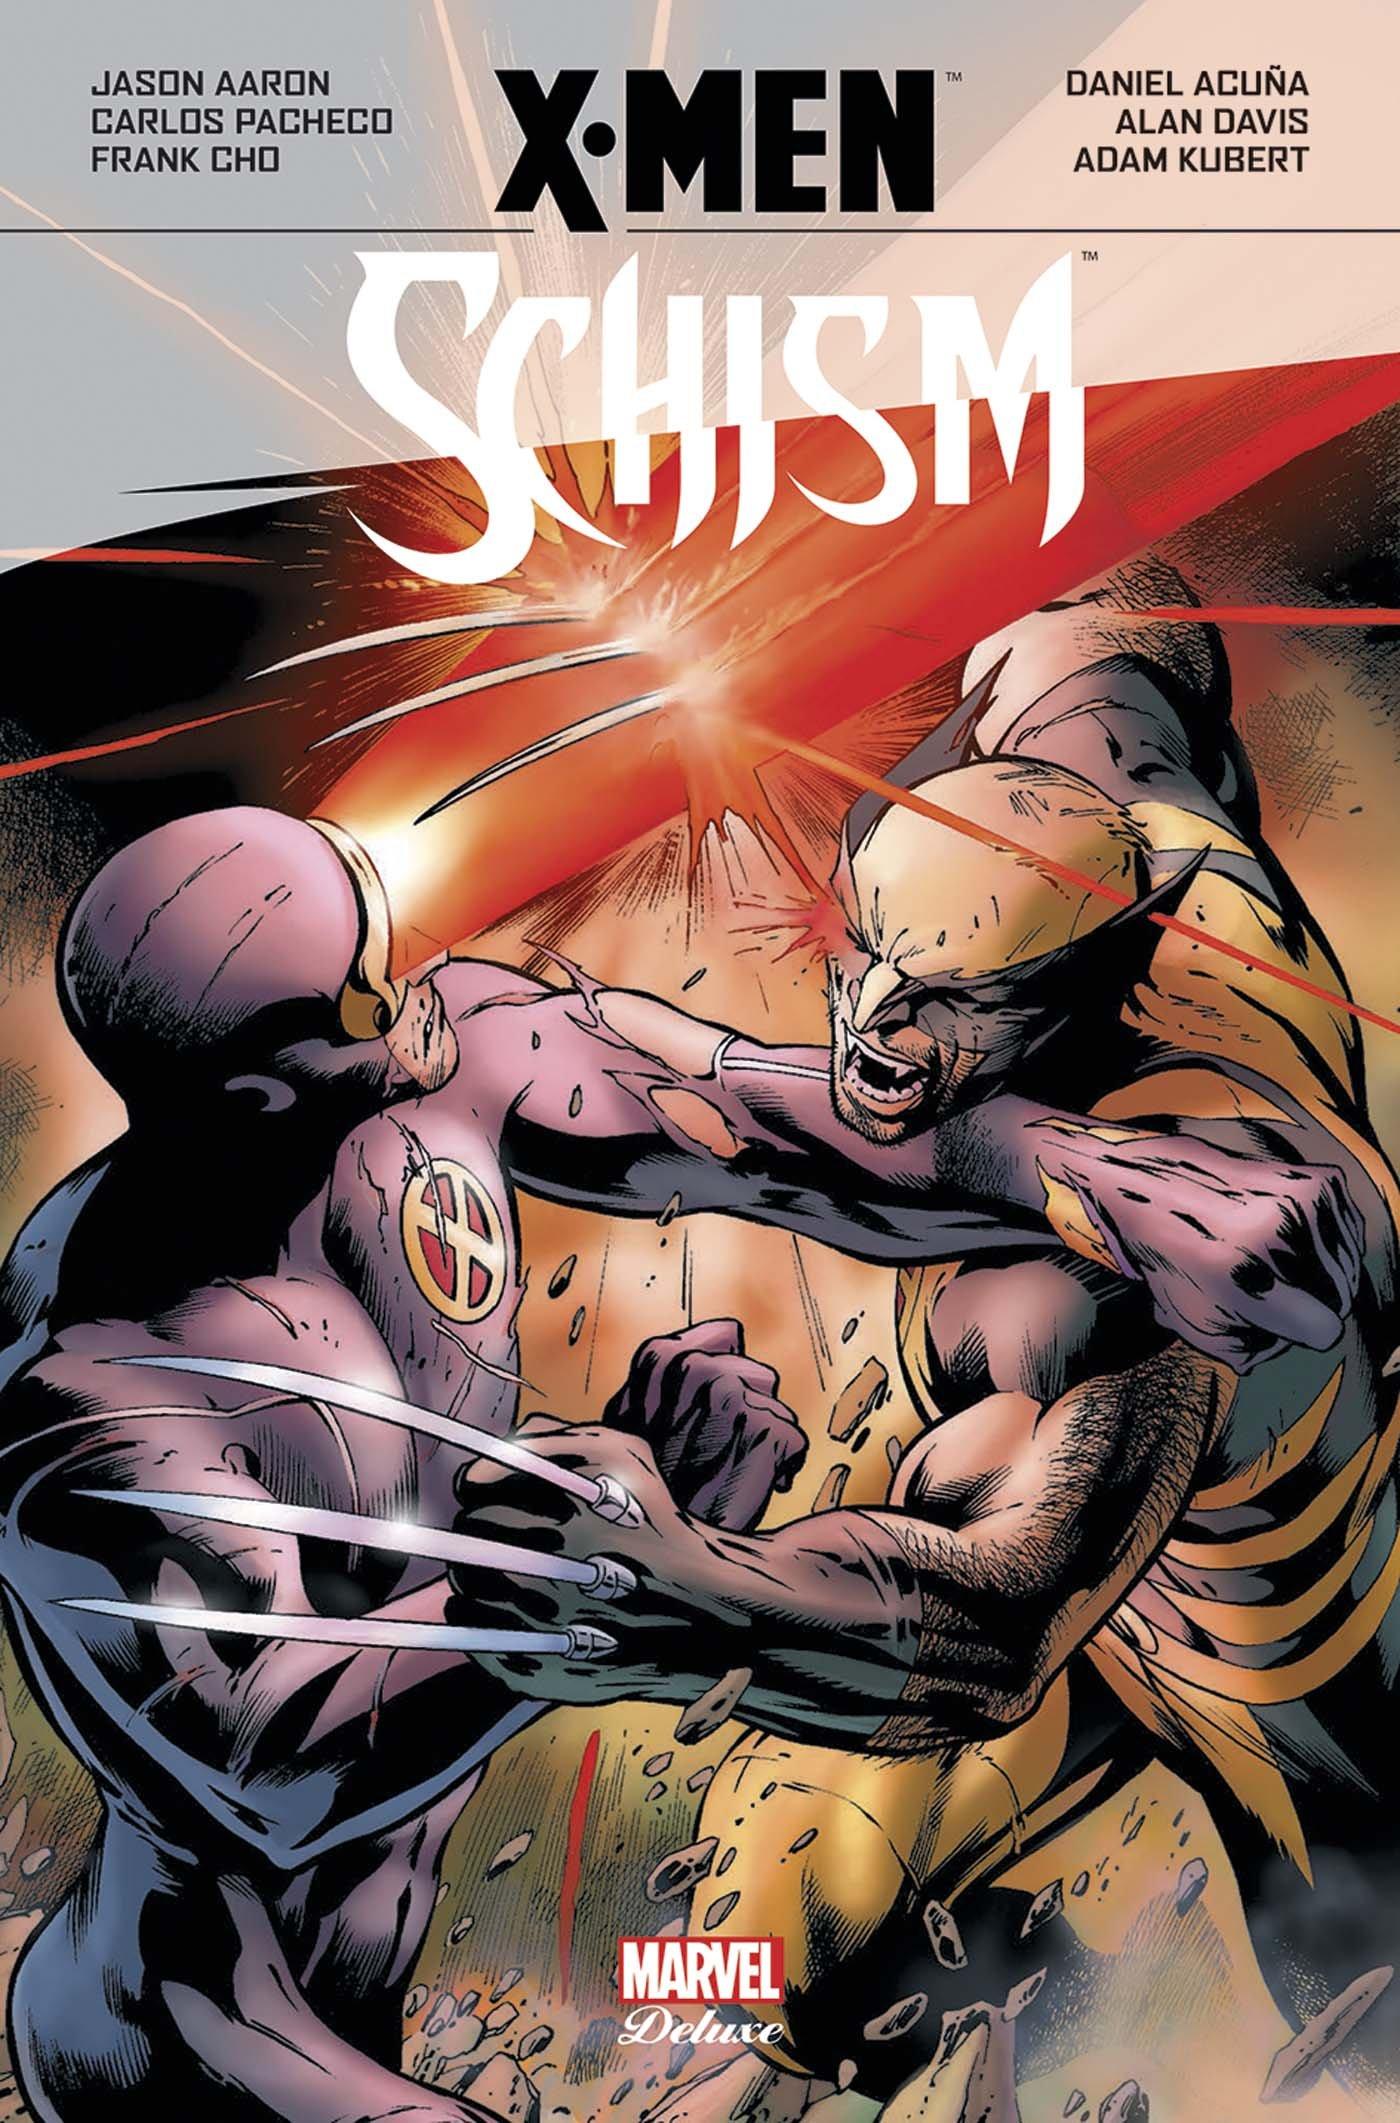 X-Men : Schism (0), comics chez Panini Comics de Gillen, Jenkins, Aaron, Pacheco, Acuña, Smith, Roberson, Tan, De La Torre, Davis, Cho, Kubert, Conrad, d' Armata, Keith, Mossa